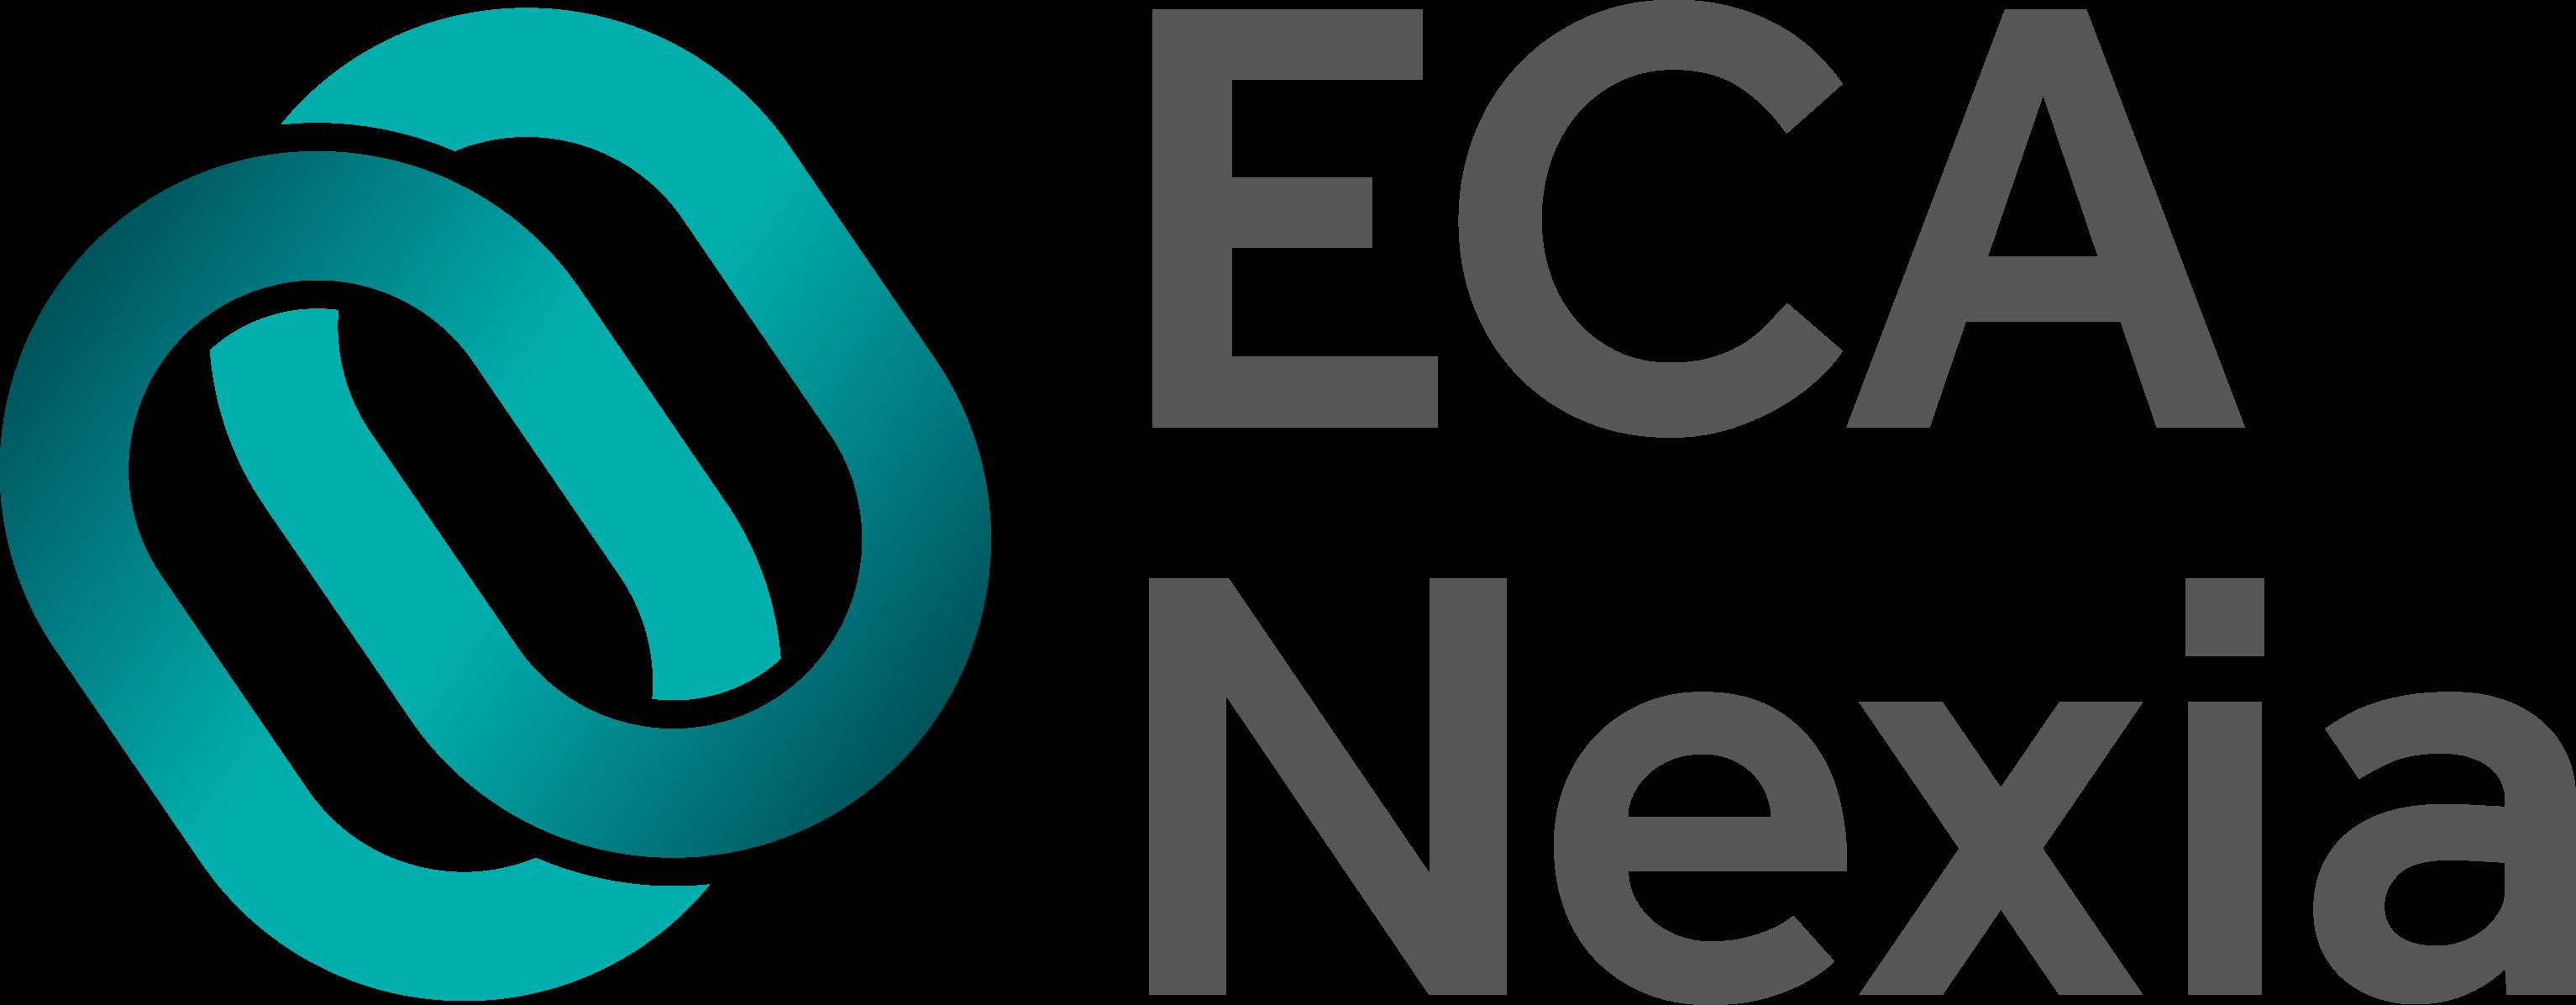 ECA Nexia New logo